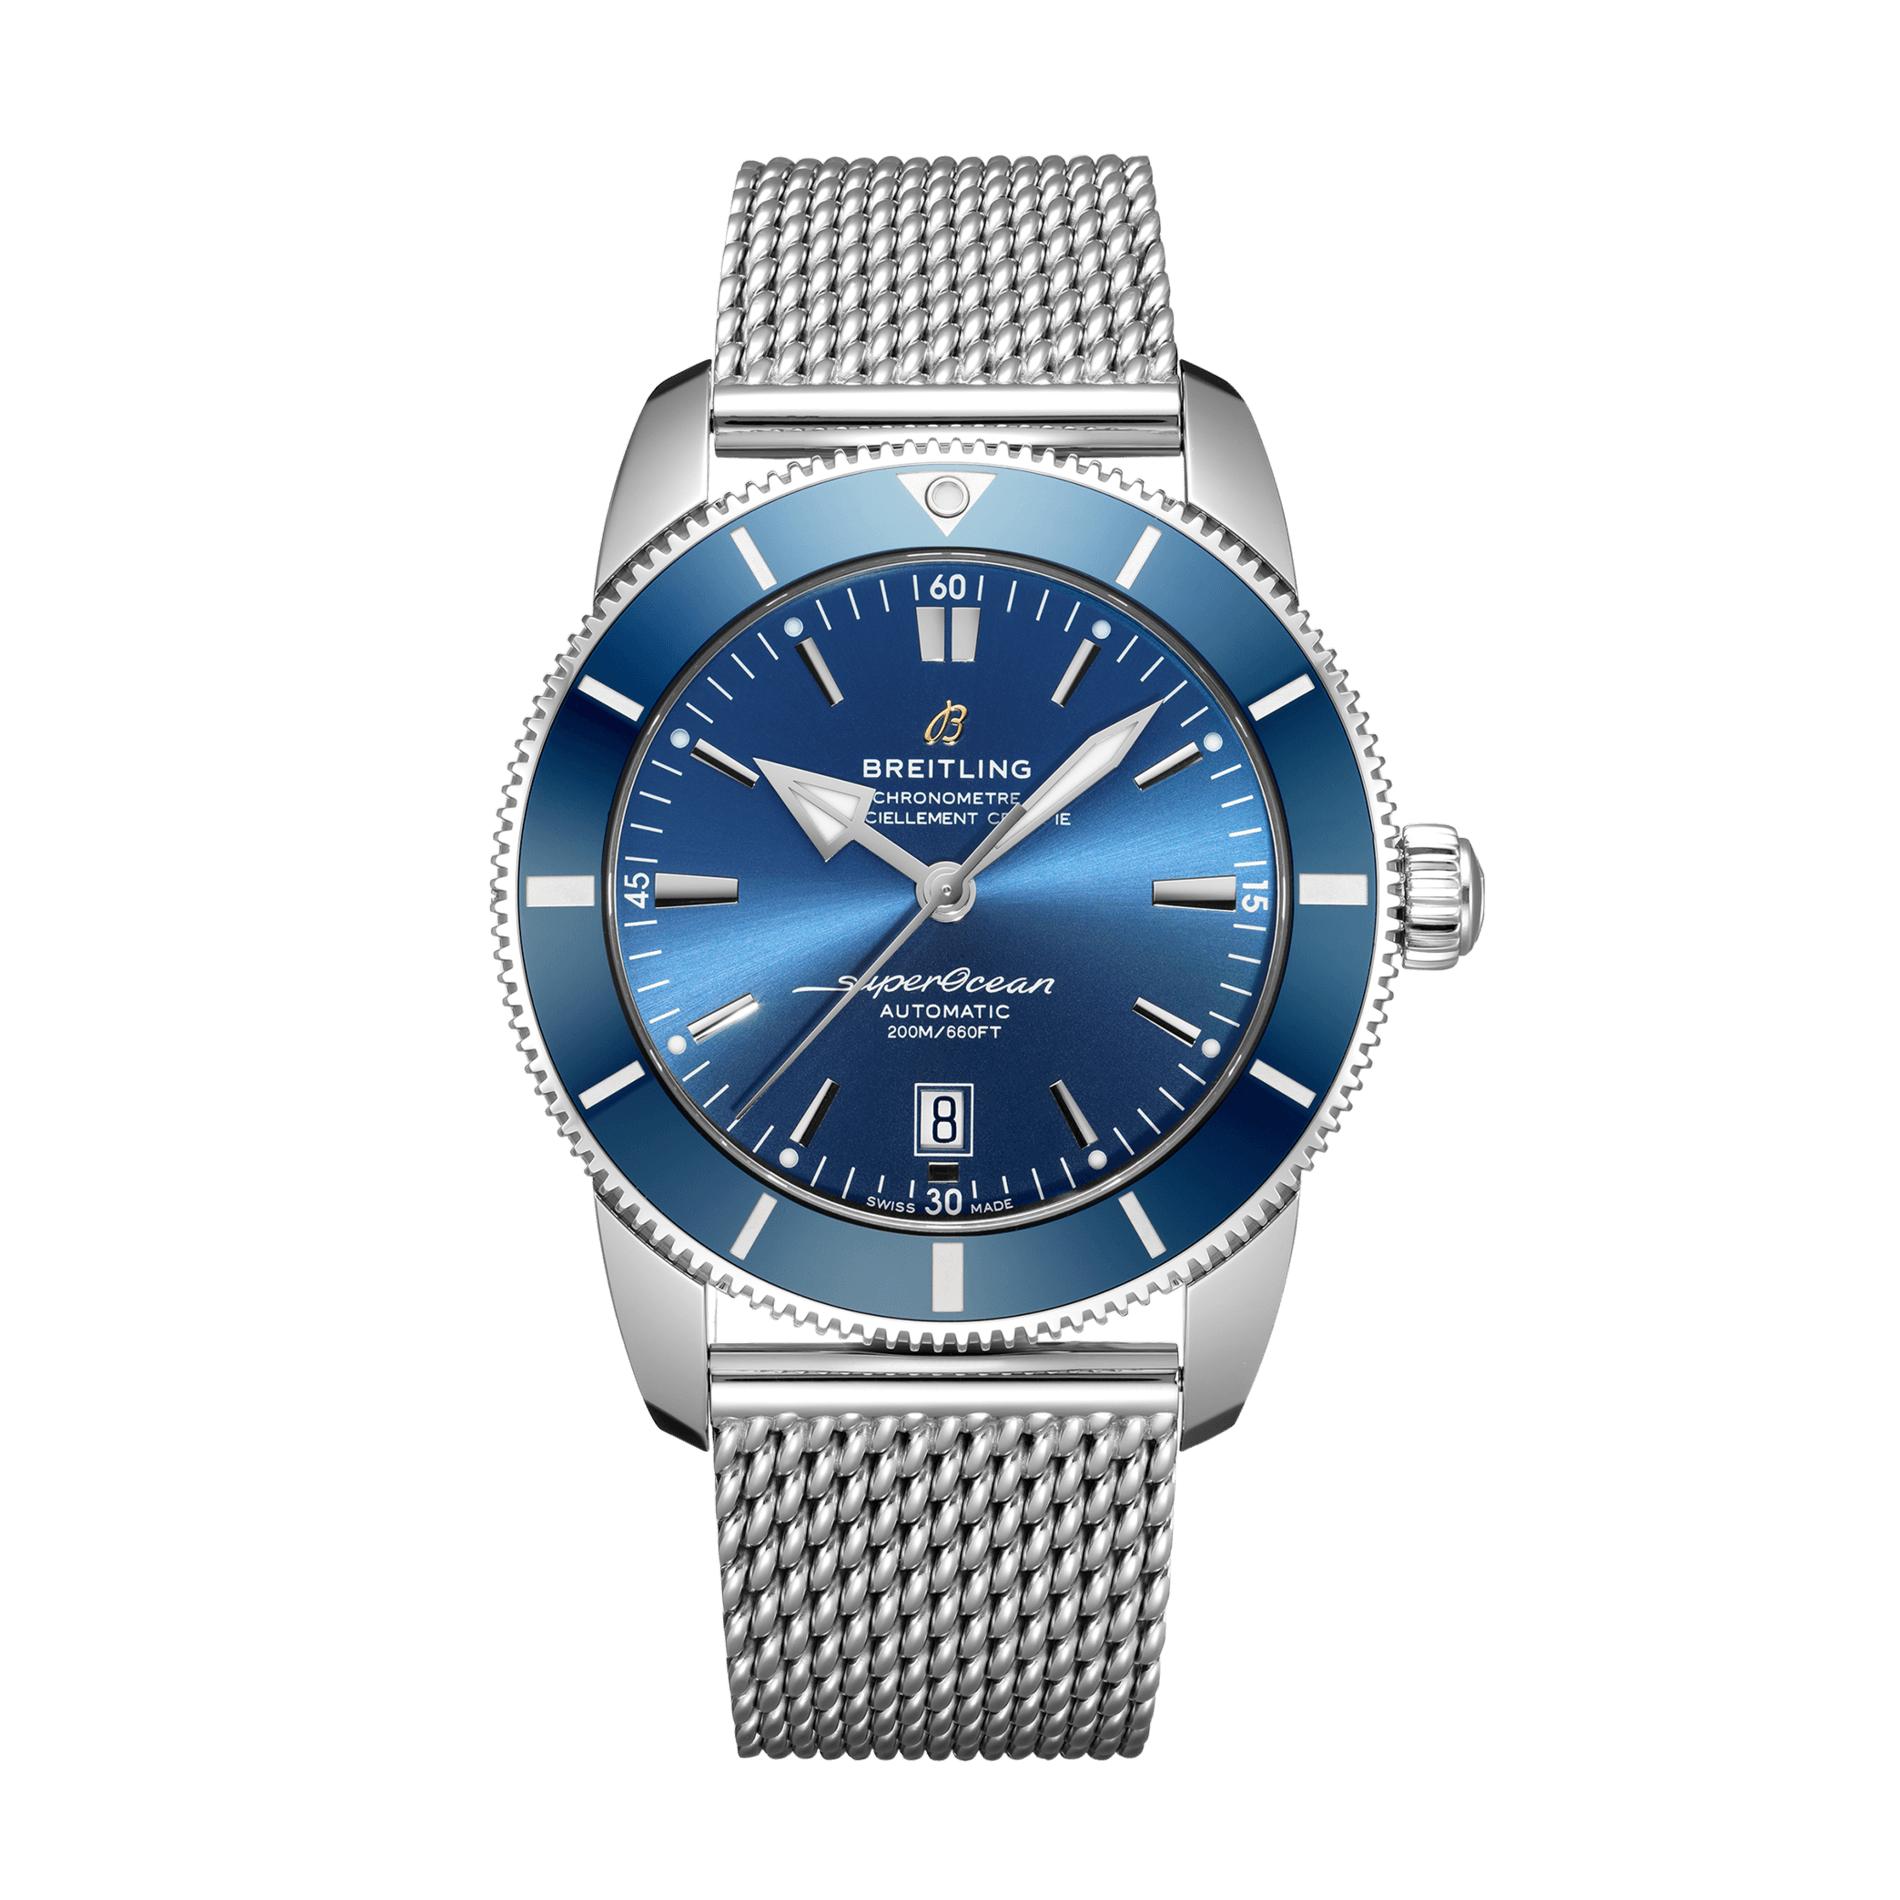 Reloj Breitling – Superocean Heritage B20 Automatic 46 - Amaya Joyeros